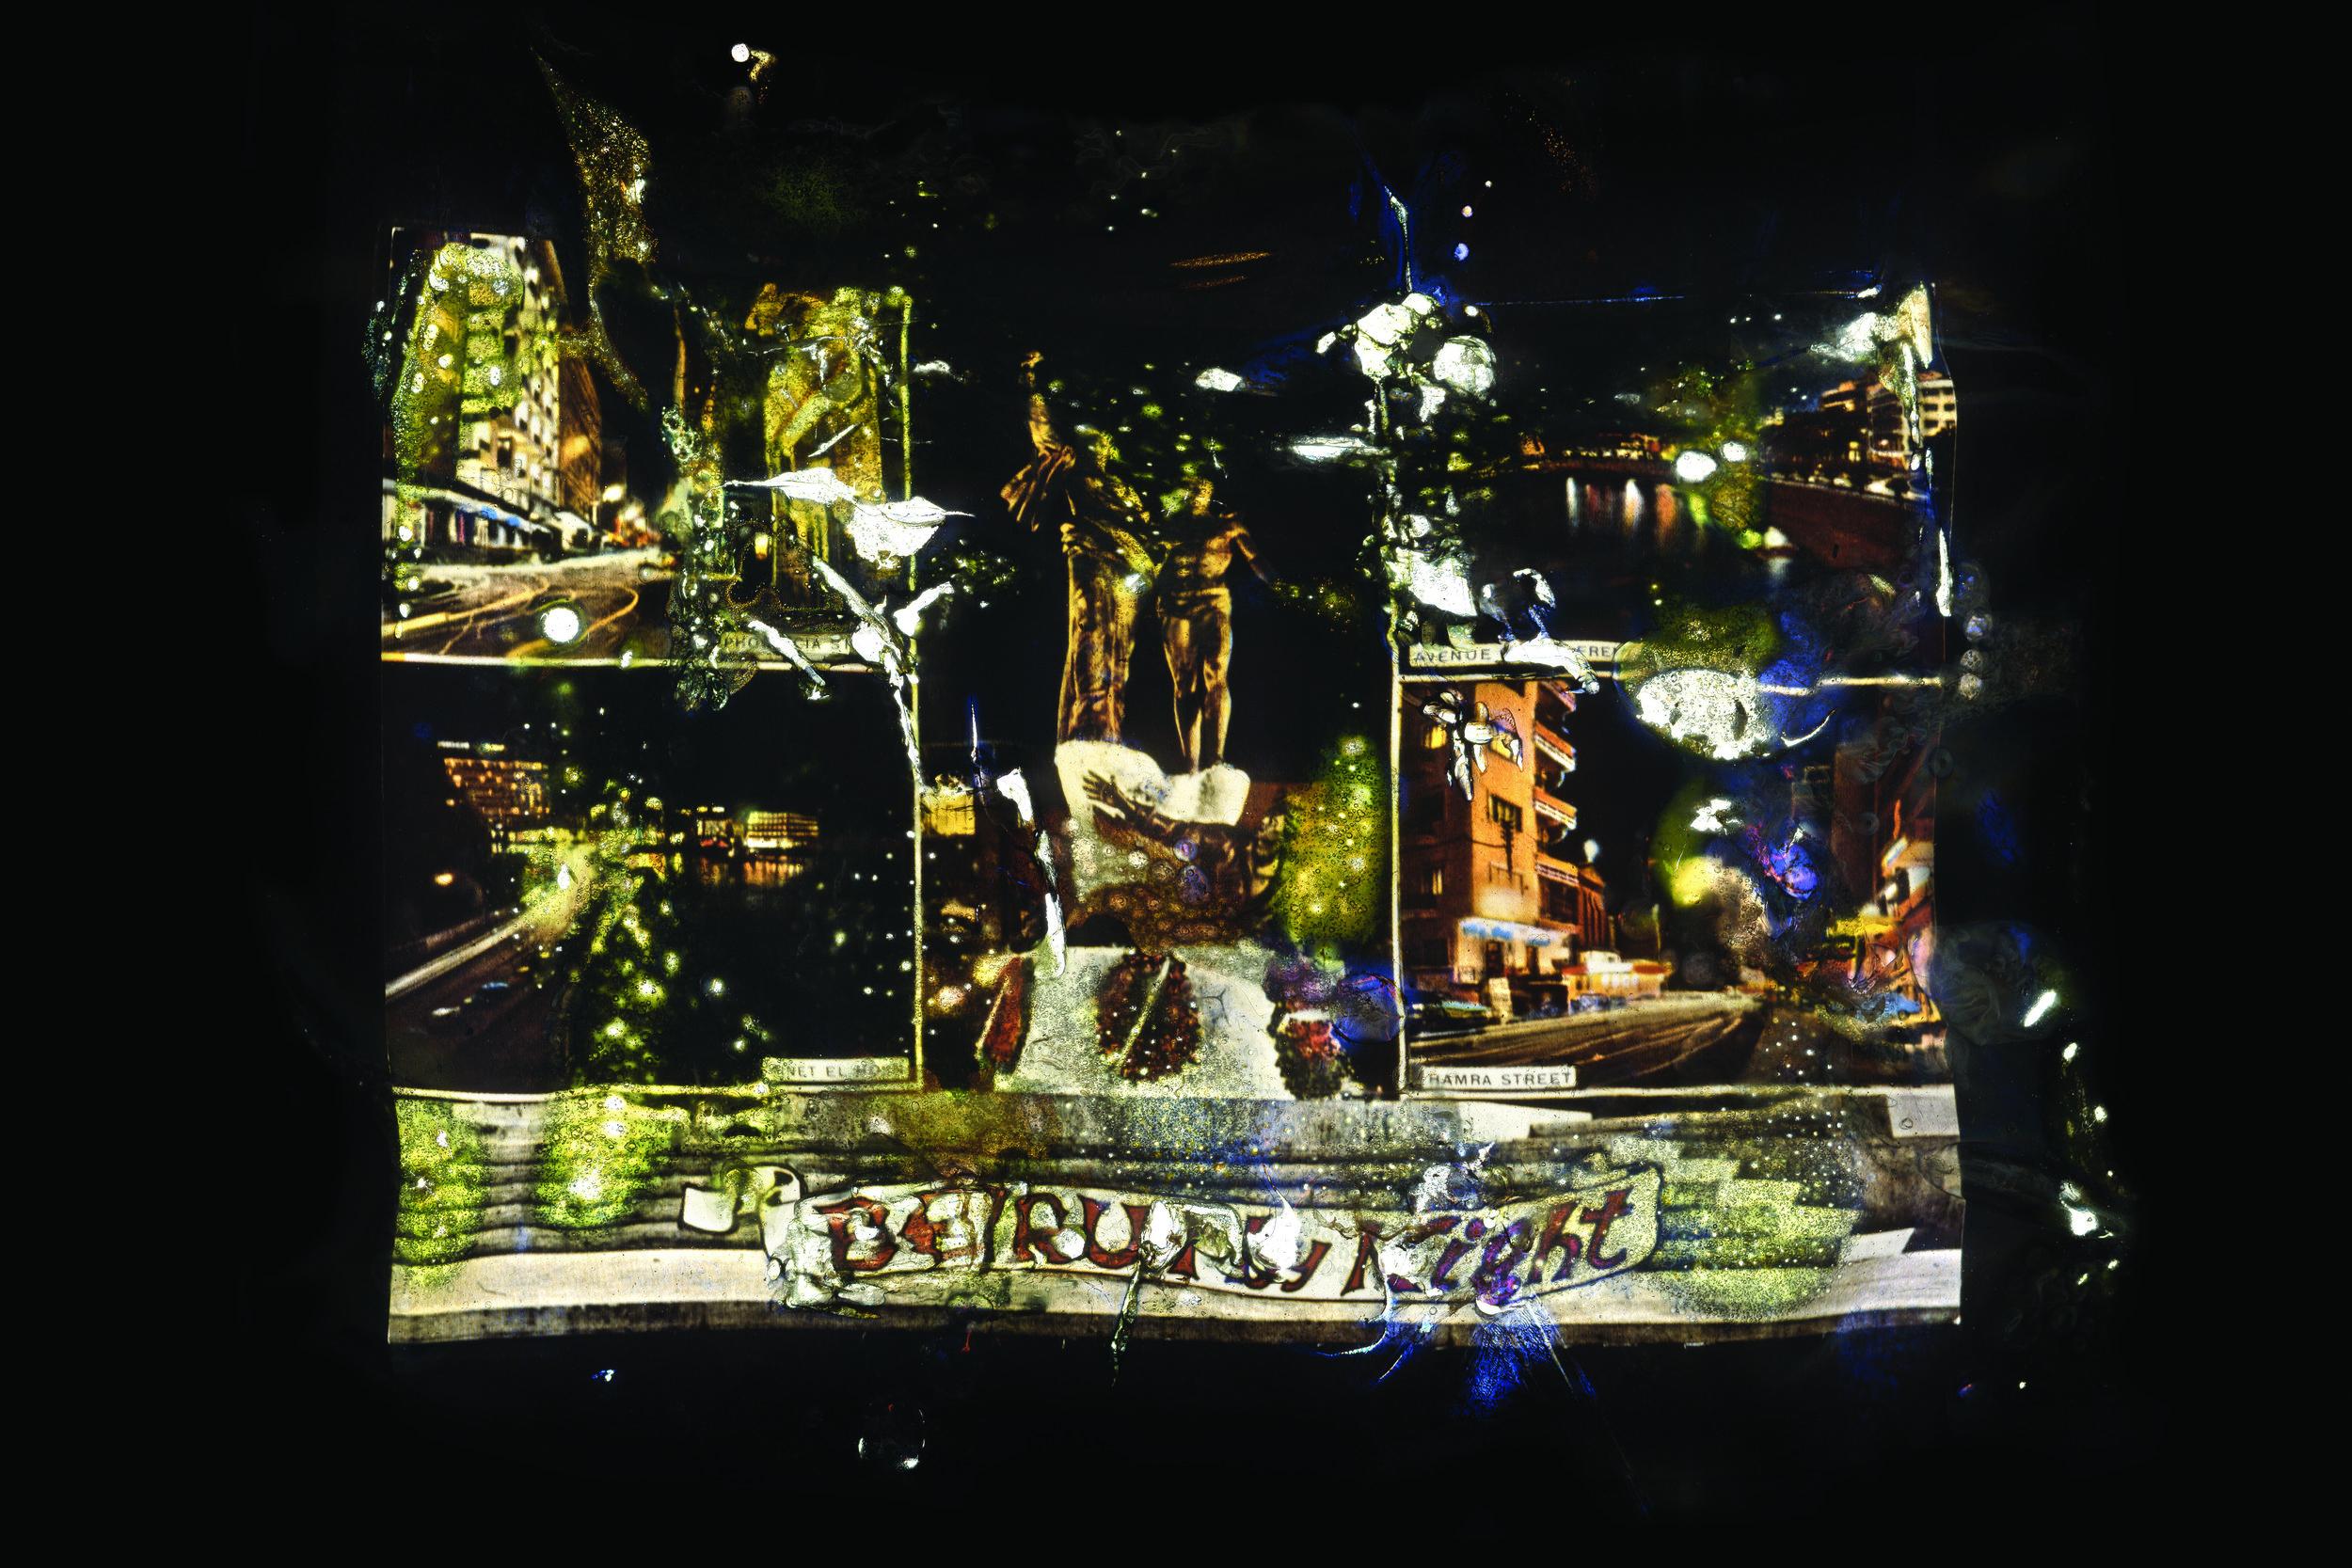 Joana Hadjithomas & Khalil Joreige, Wonder Beirut #20 (Beirut By Night), 1998 - 2006. Photographic print mounted on aluminium and diasec, 70 x 105 cm.Courtesy of the artists & In Situ - Fabienne Leclerc